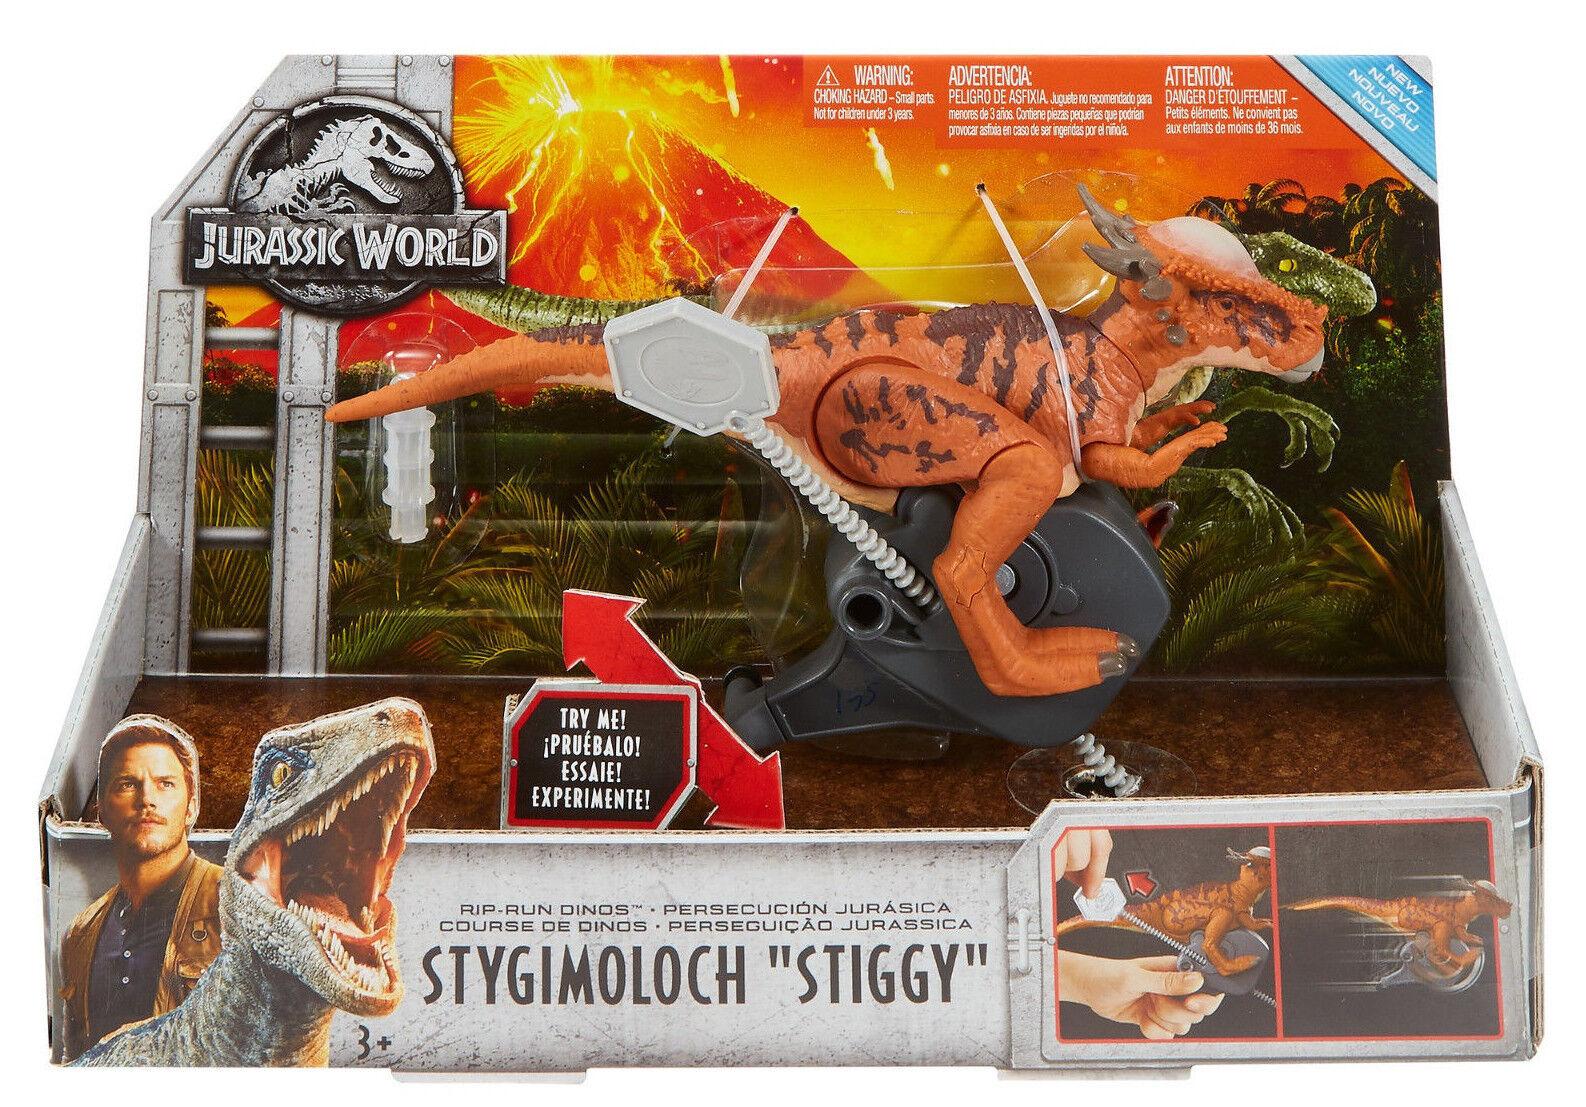 Jurassic World RIP RUN DINOS STIGIMOLOCH STIGGY FIGURE FALLEN KINGDON CONNECTS